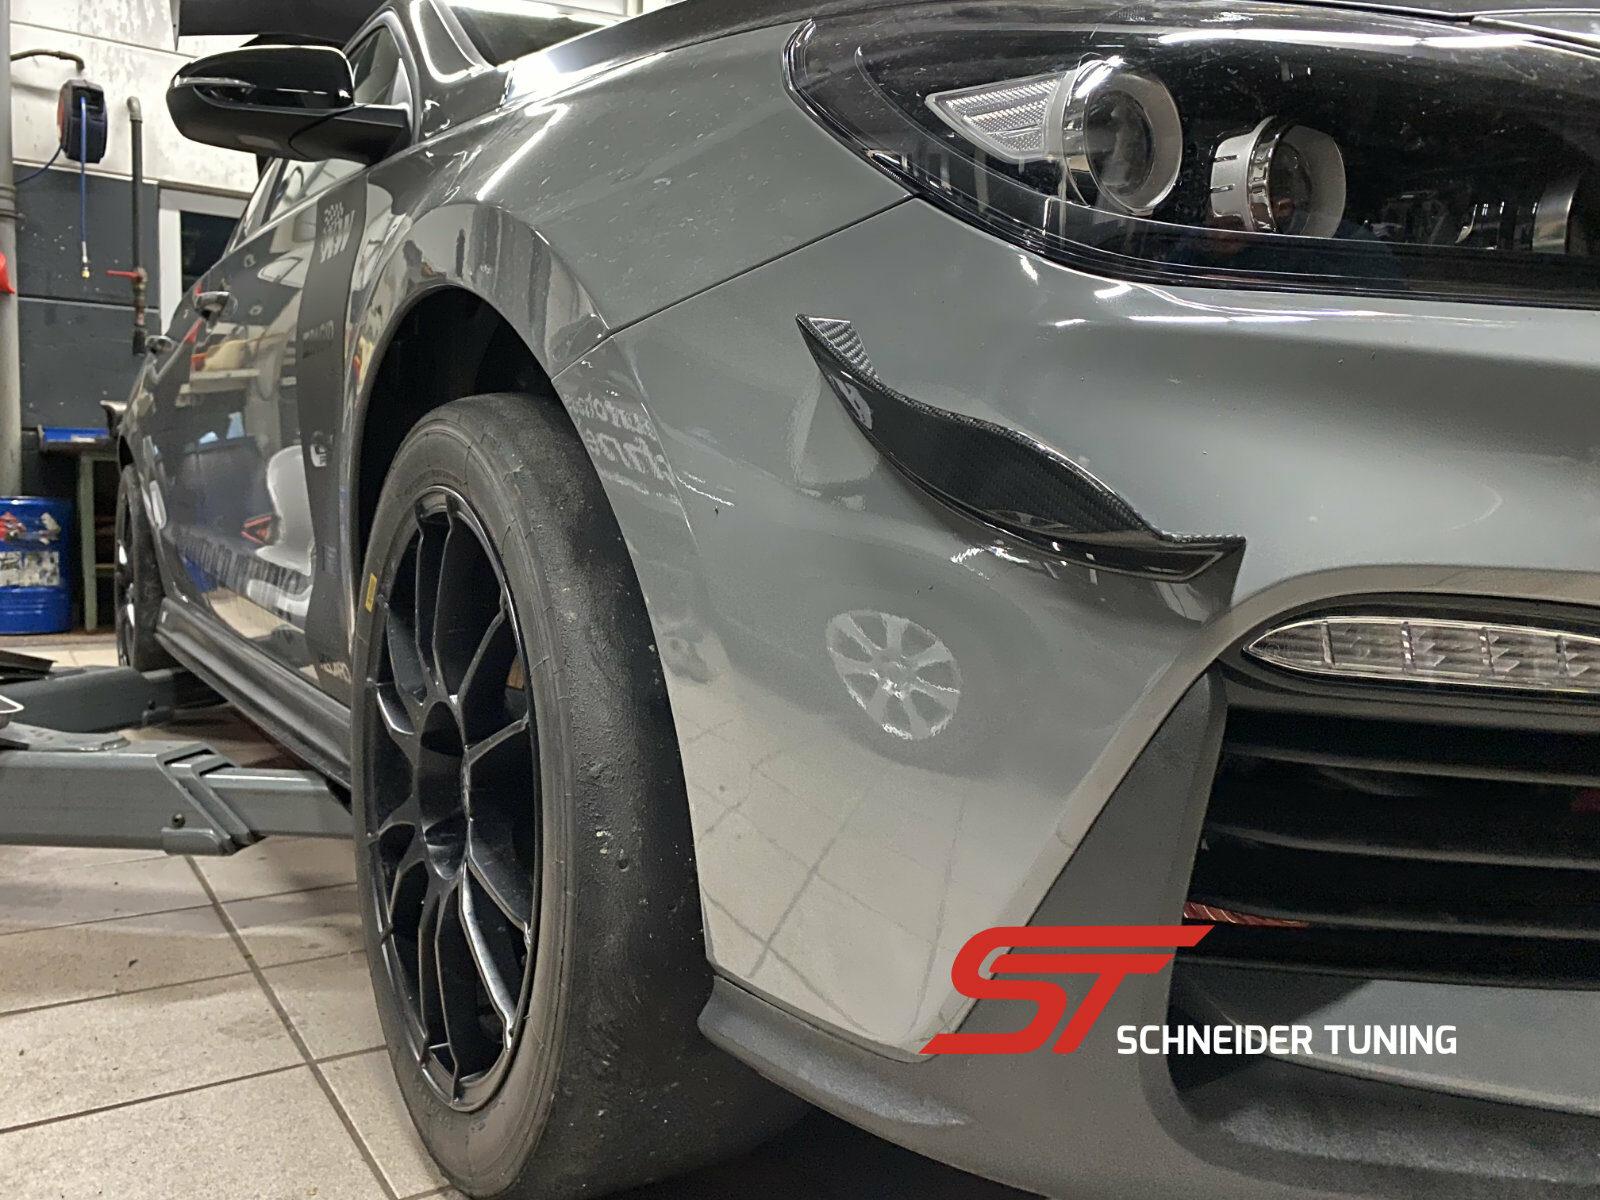 hyundai-i30n-performance-tracktool-ringtool-motorsport-carbon-wings-canards